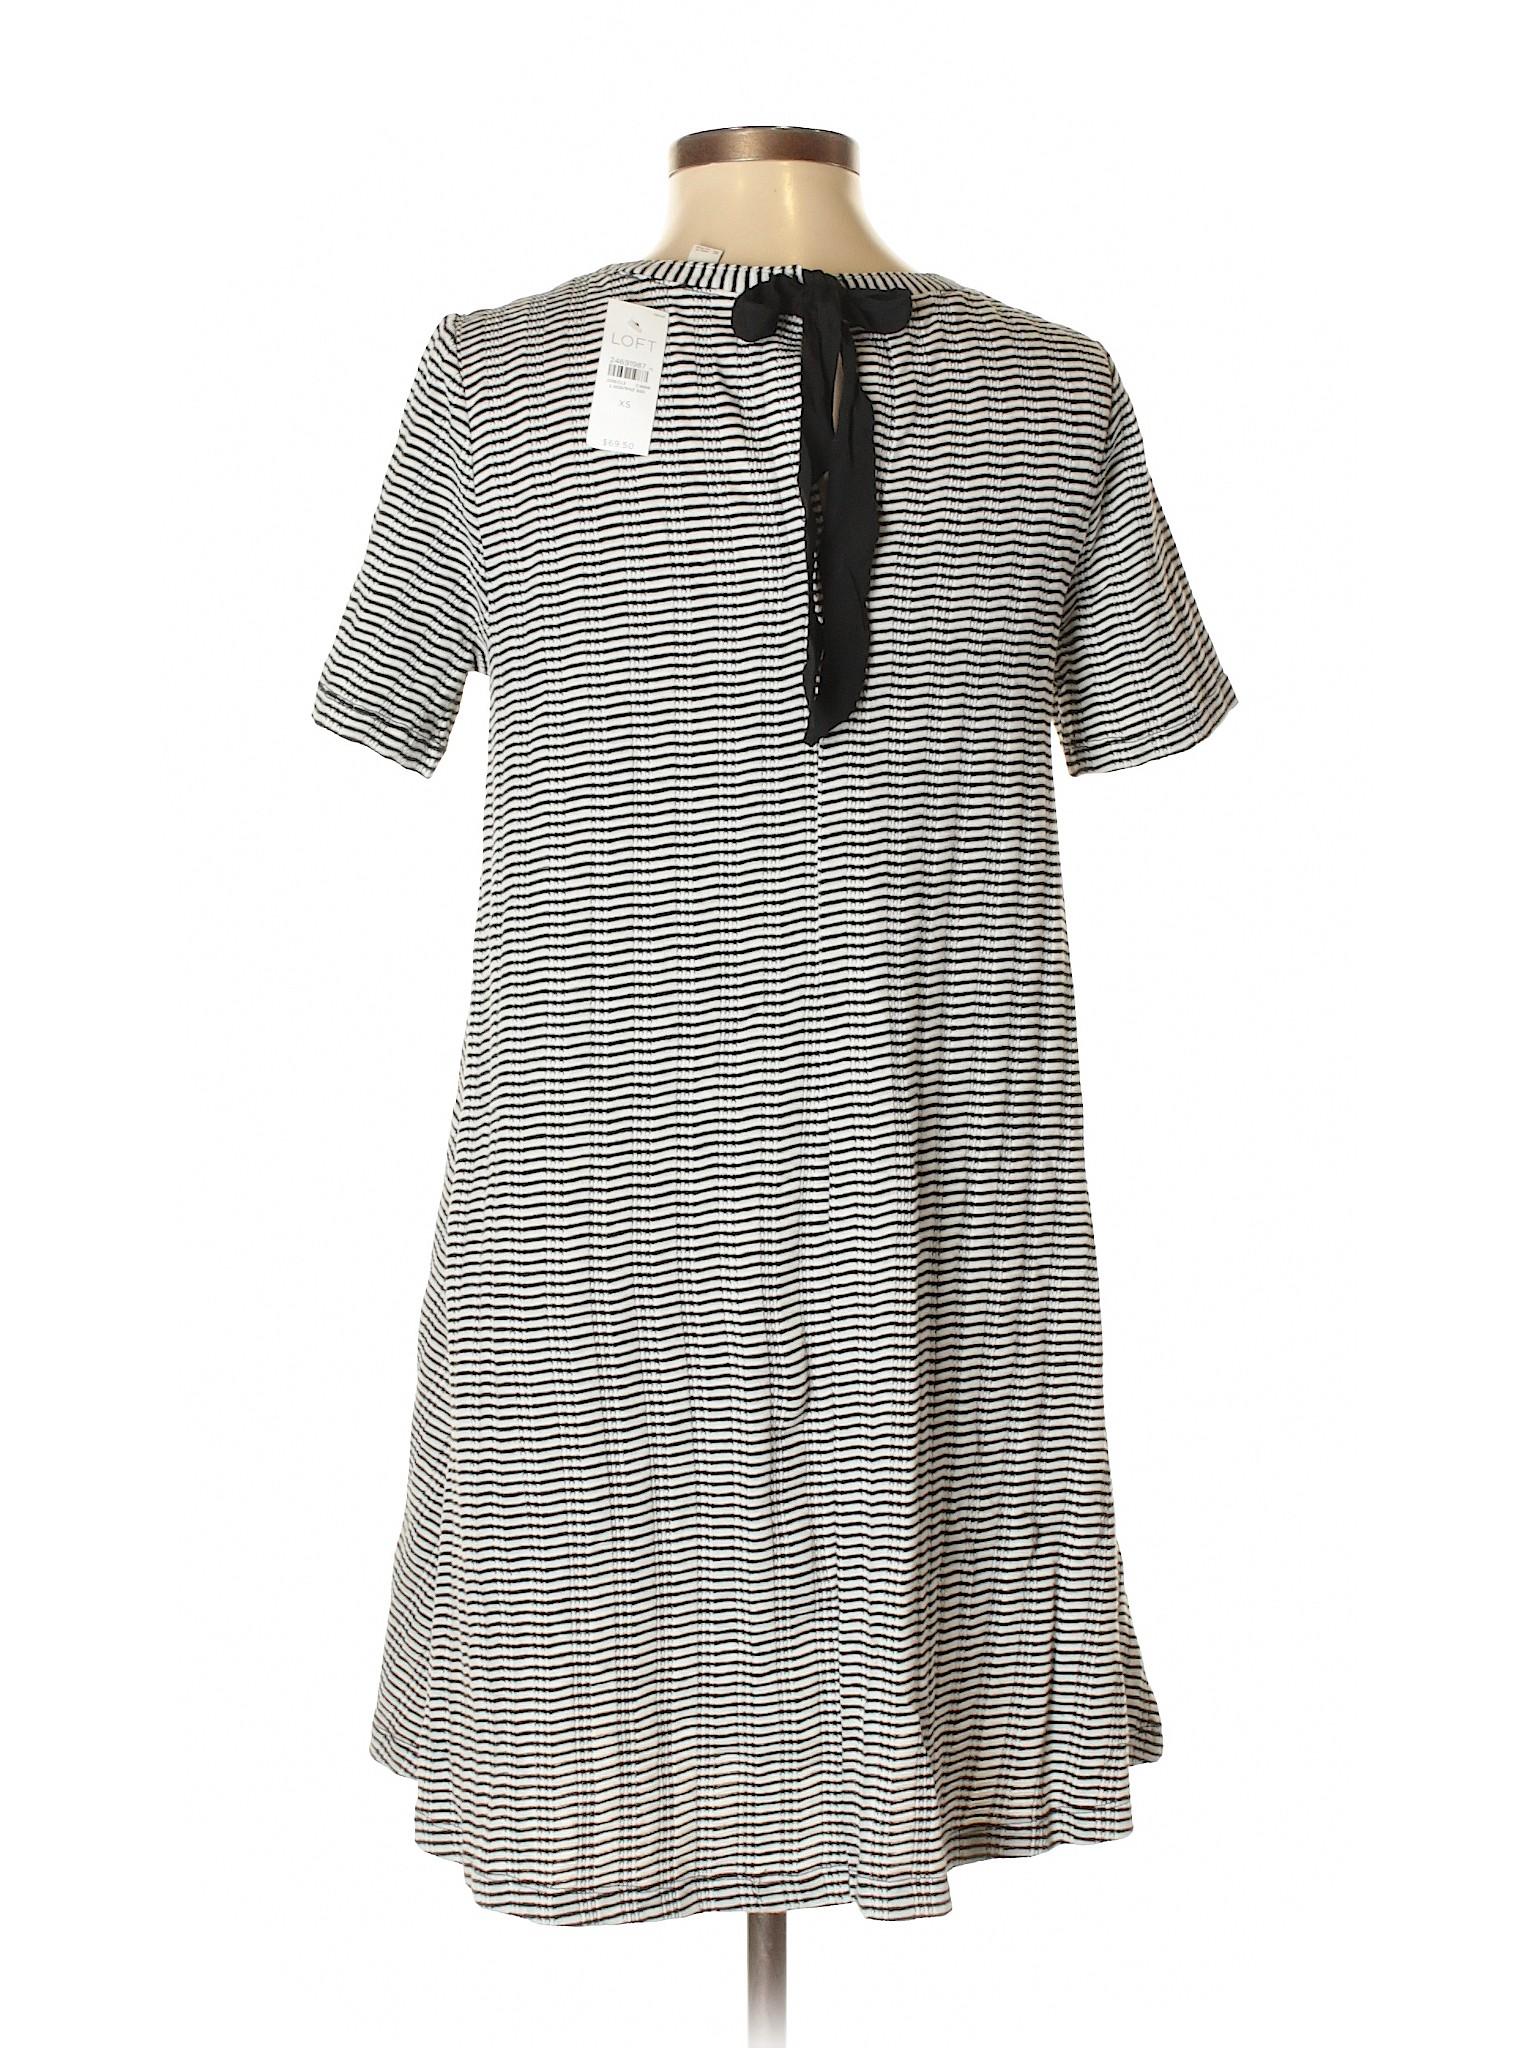 Casual Taylor Dress LOFT Selling Ann CqBFxA